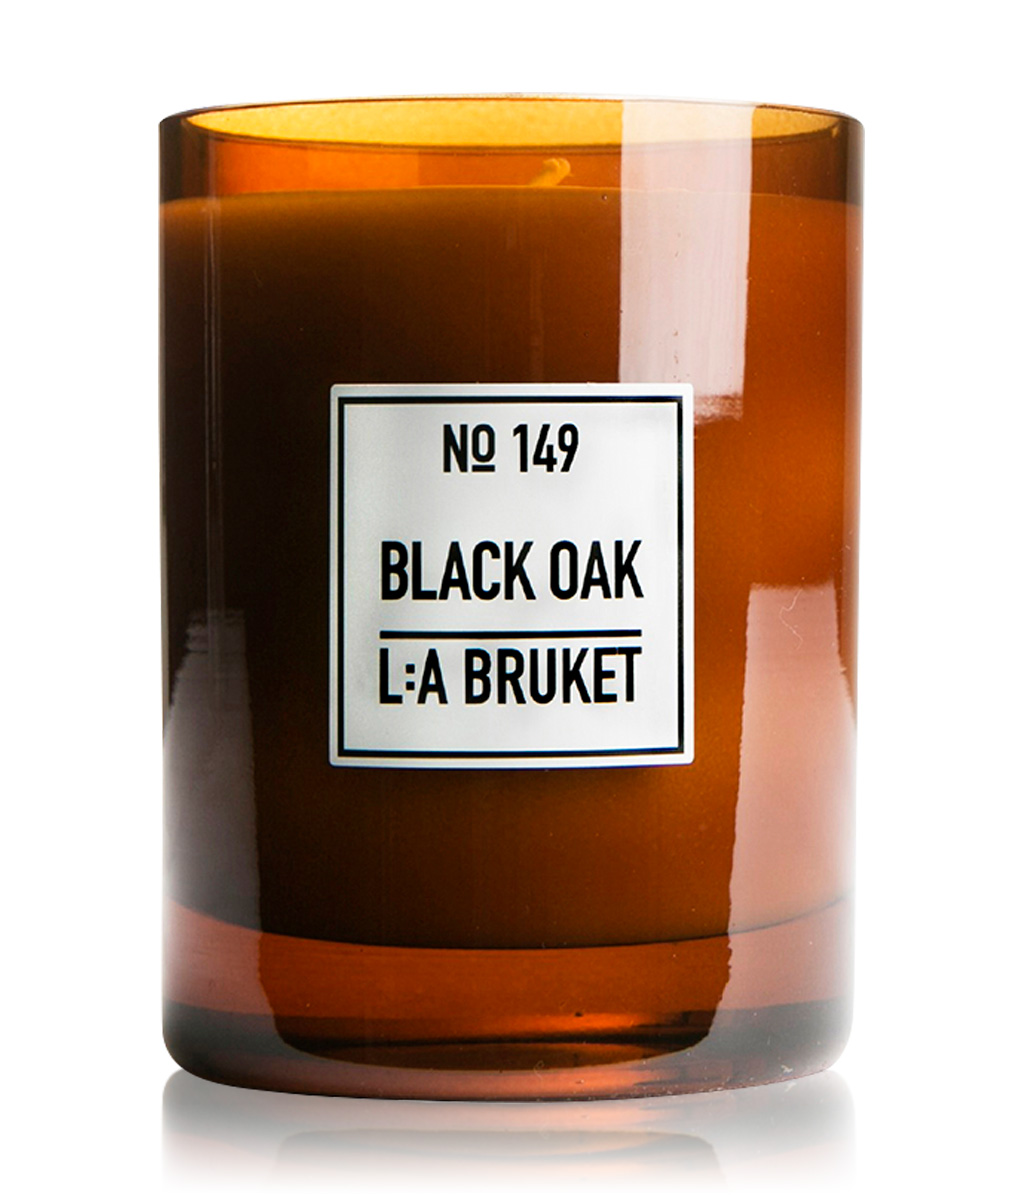 L-A Bruket Black Oak No. 149